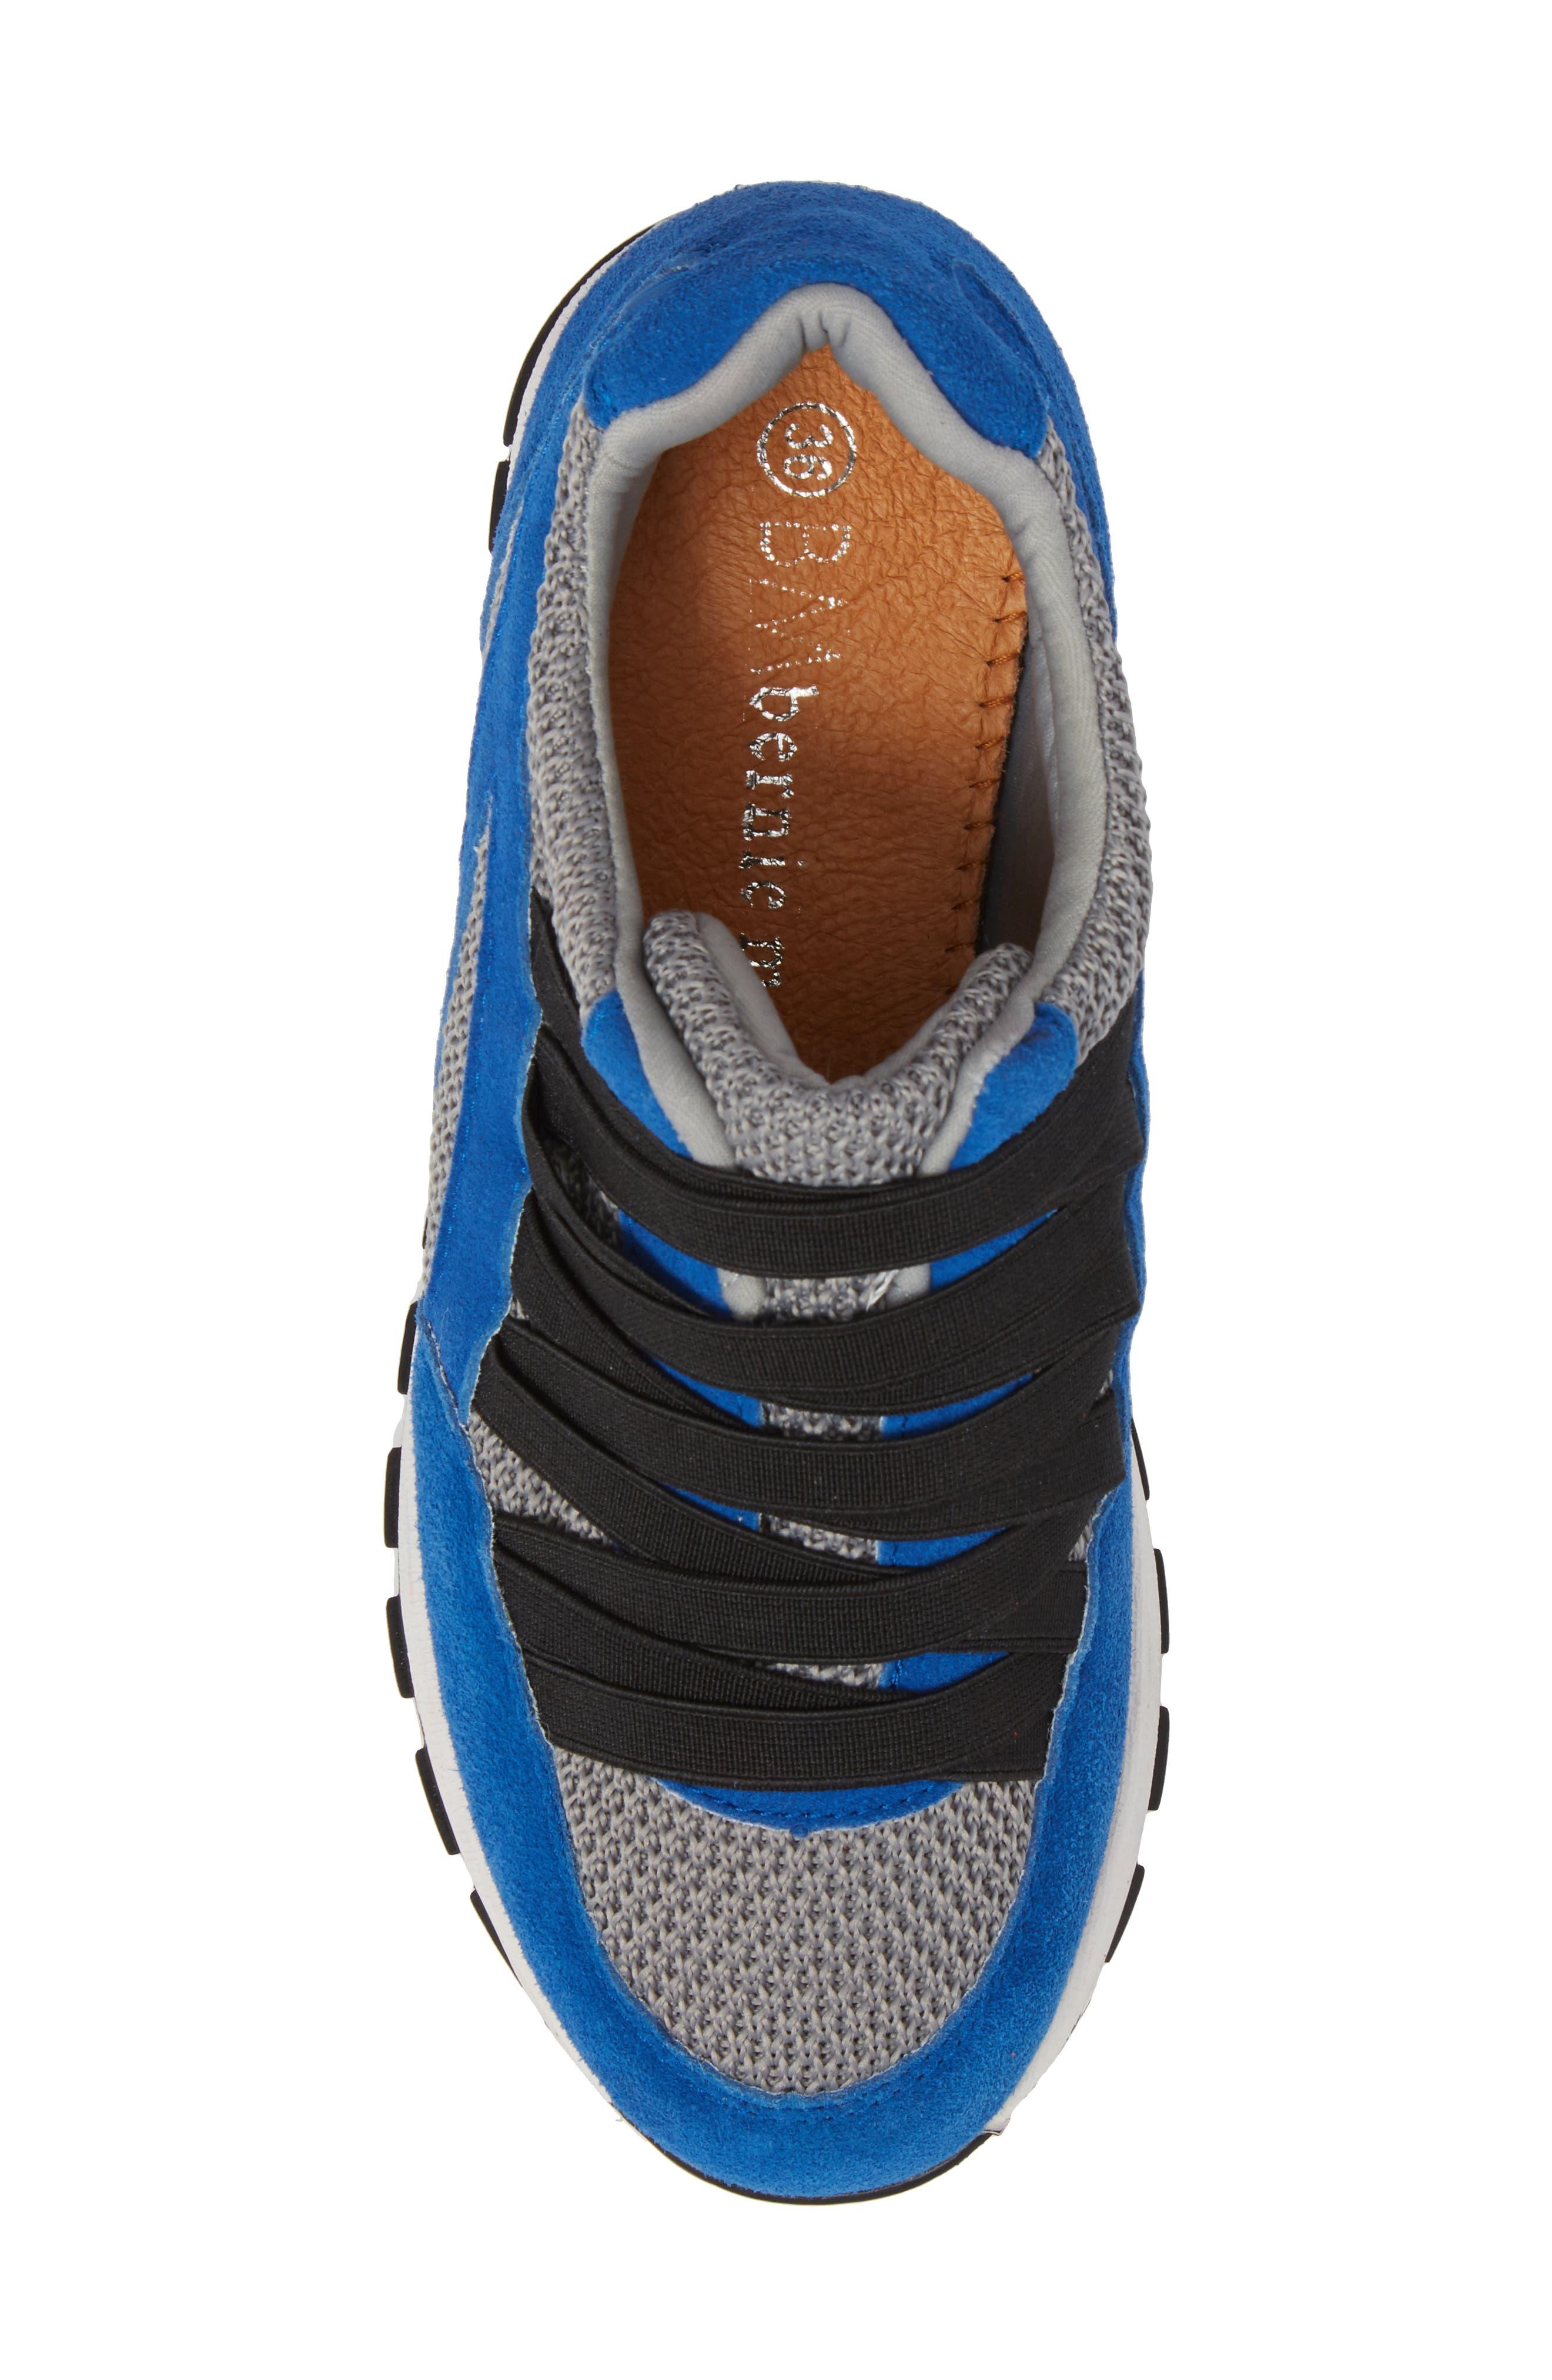 Bernie Mev Tara Cano Sneaker,                             Alternate thumbnail 5, color,                             ROYAL BLUE/ GREY FABRIC